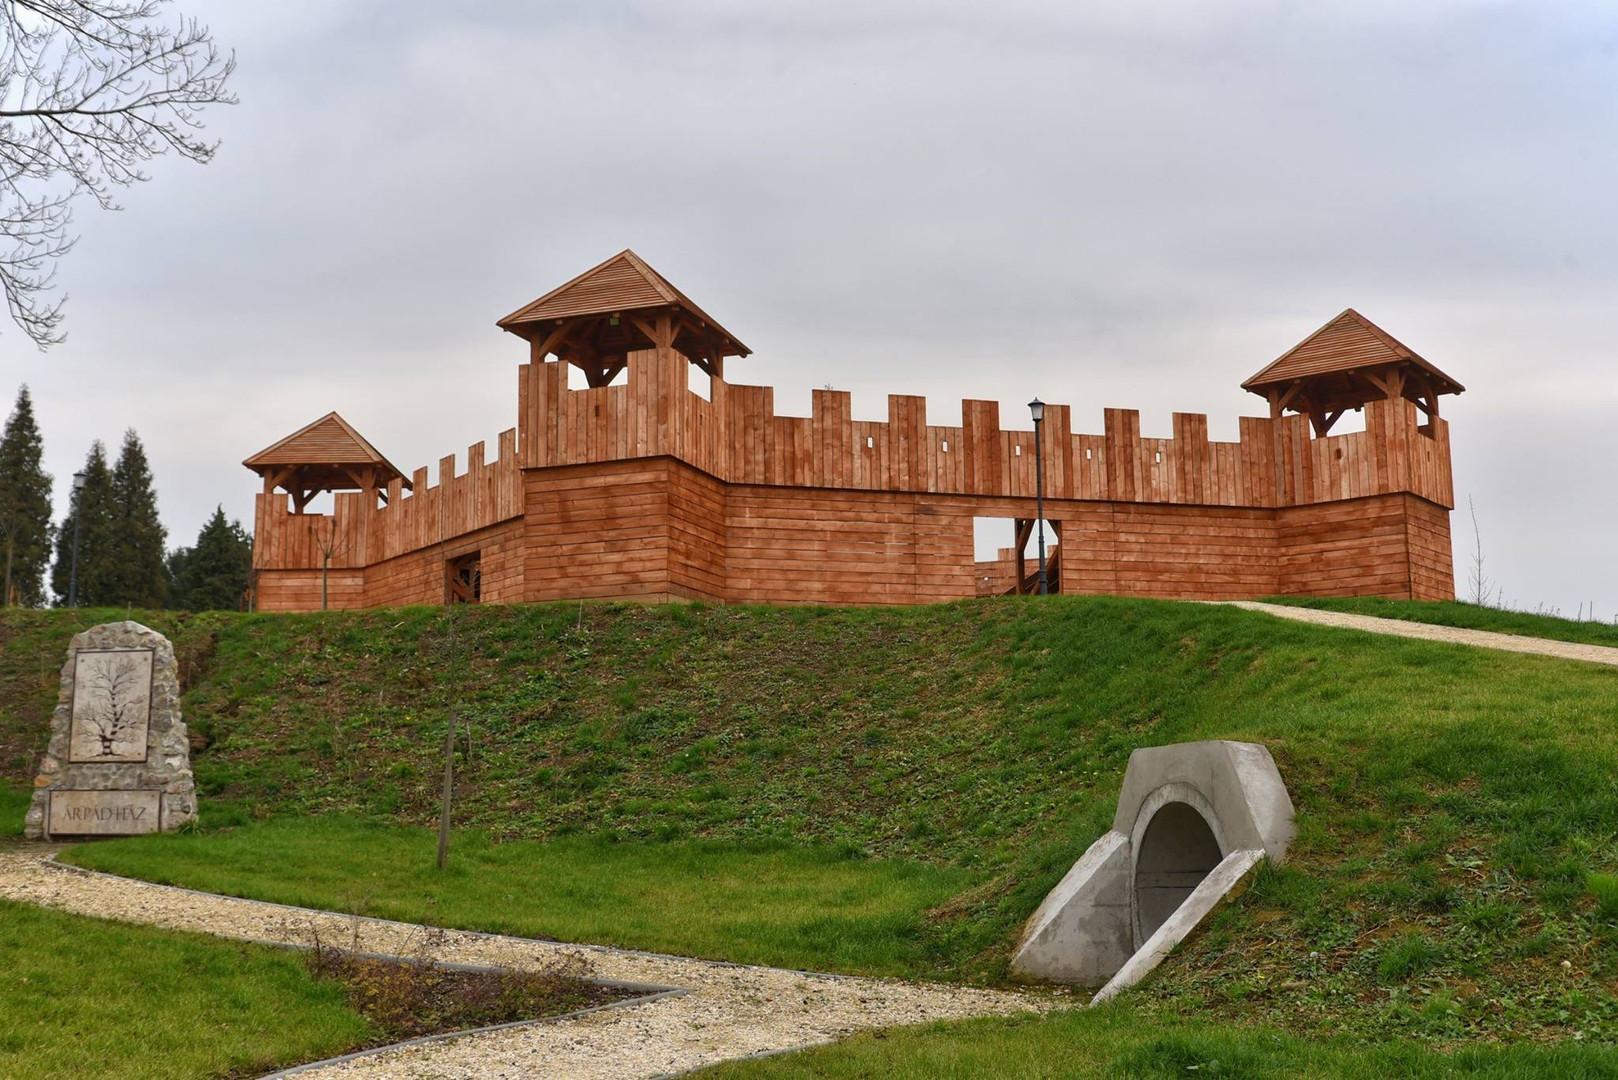 Csurgo Historical Park